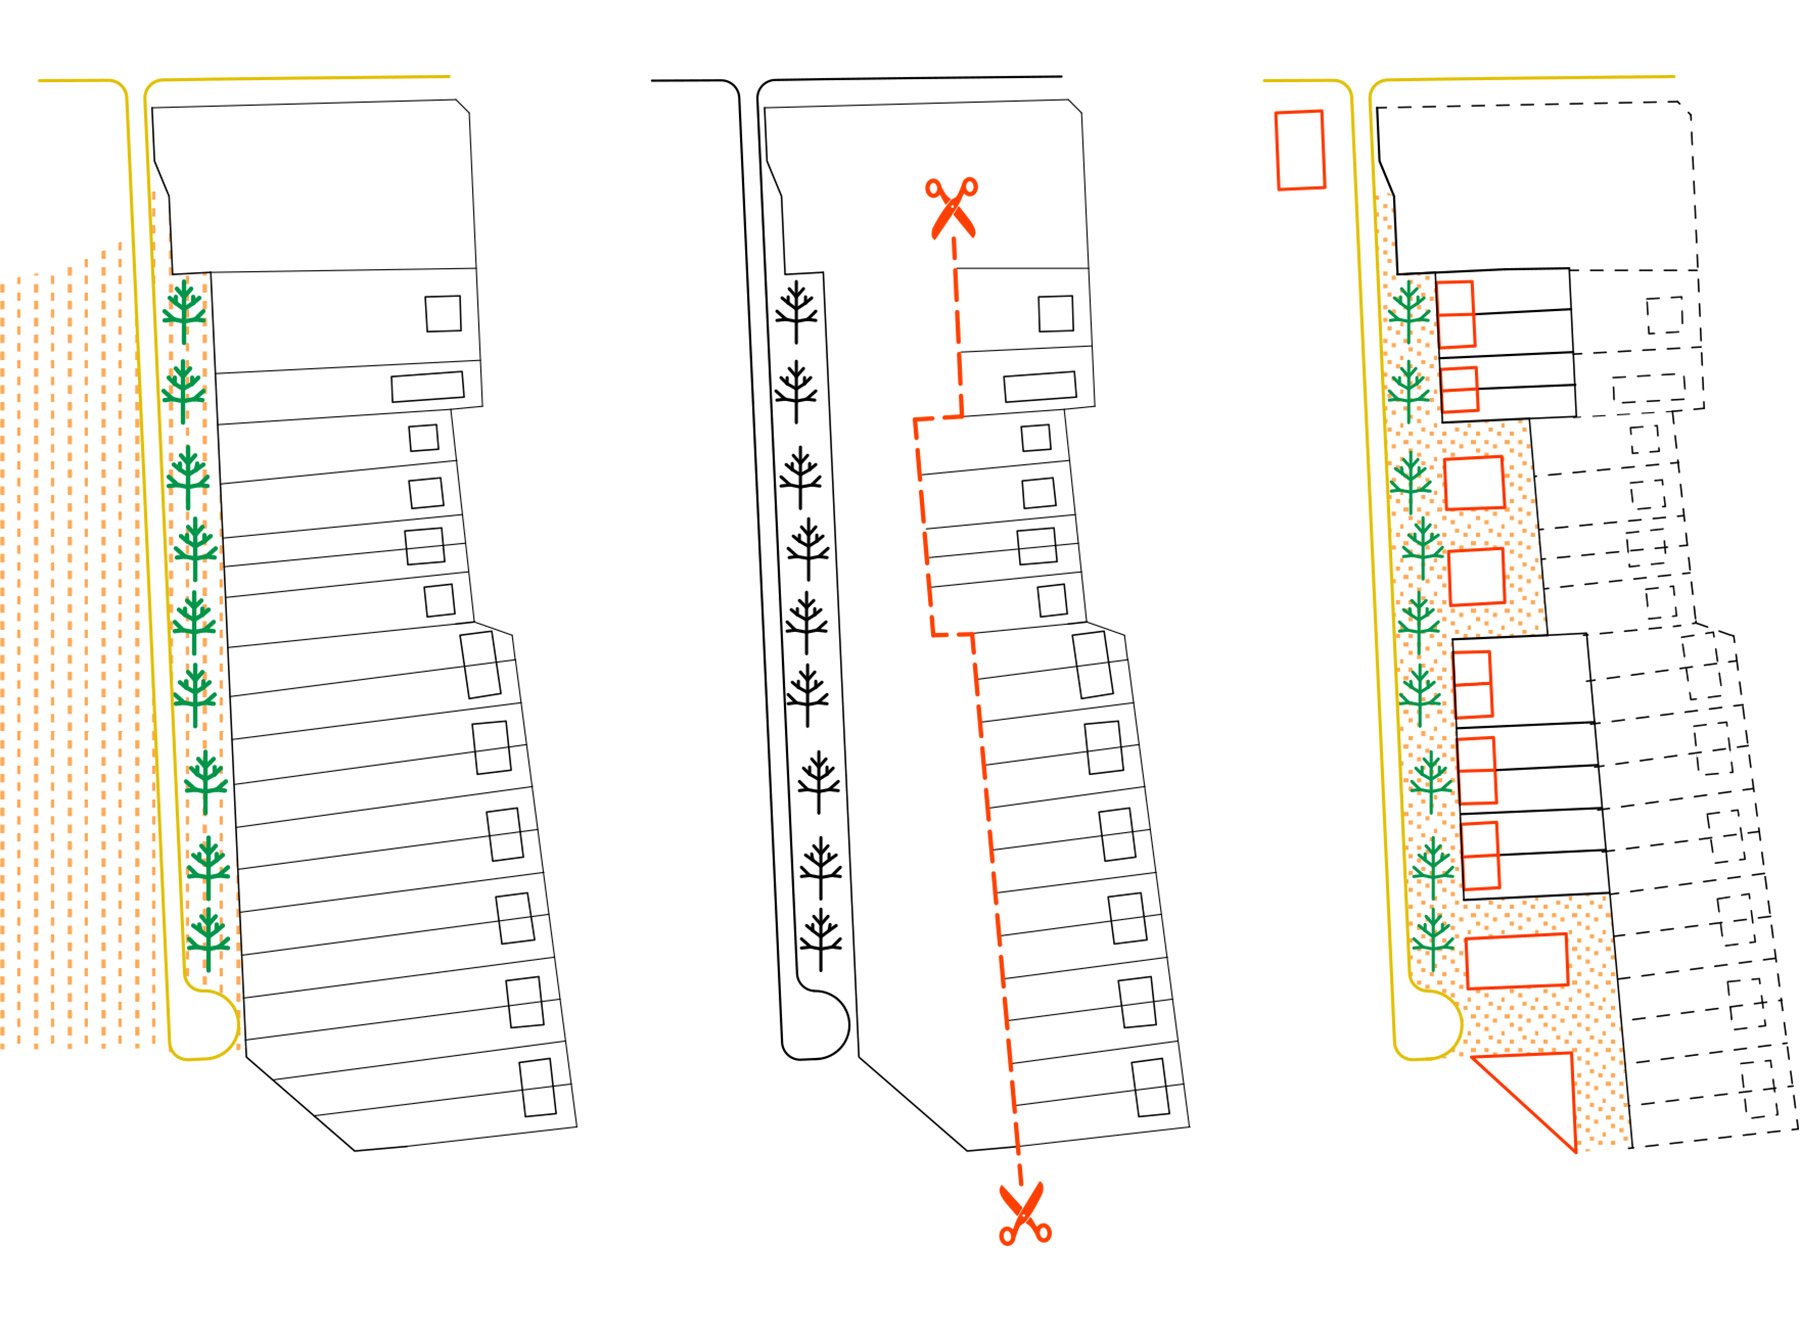 housing plot division